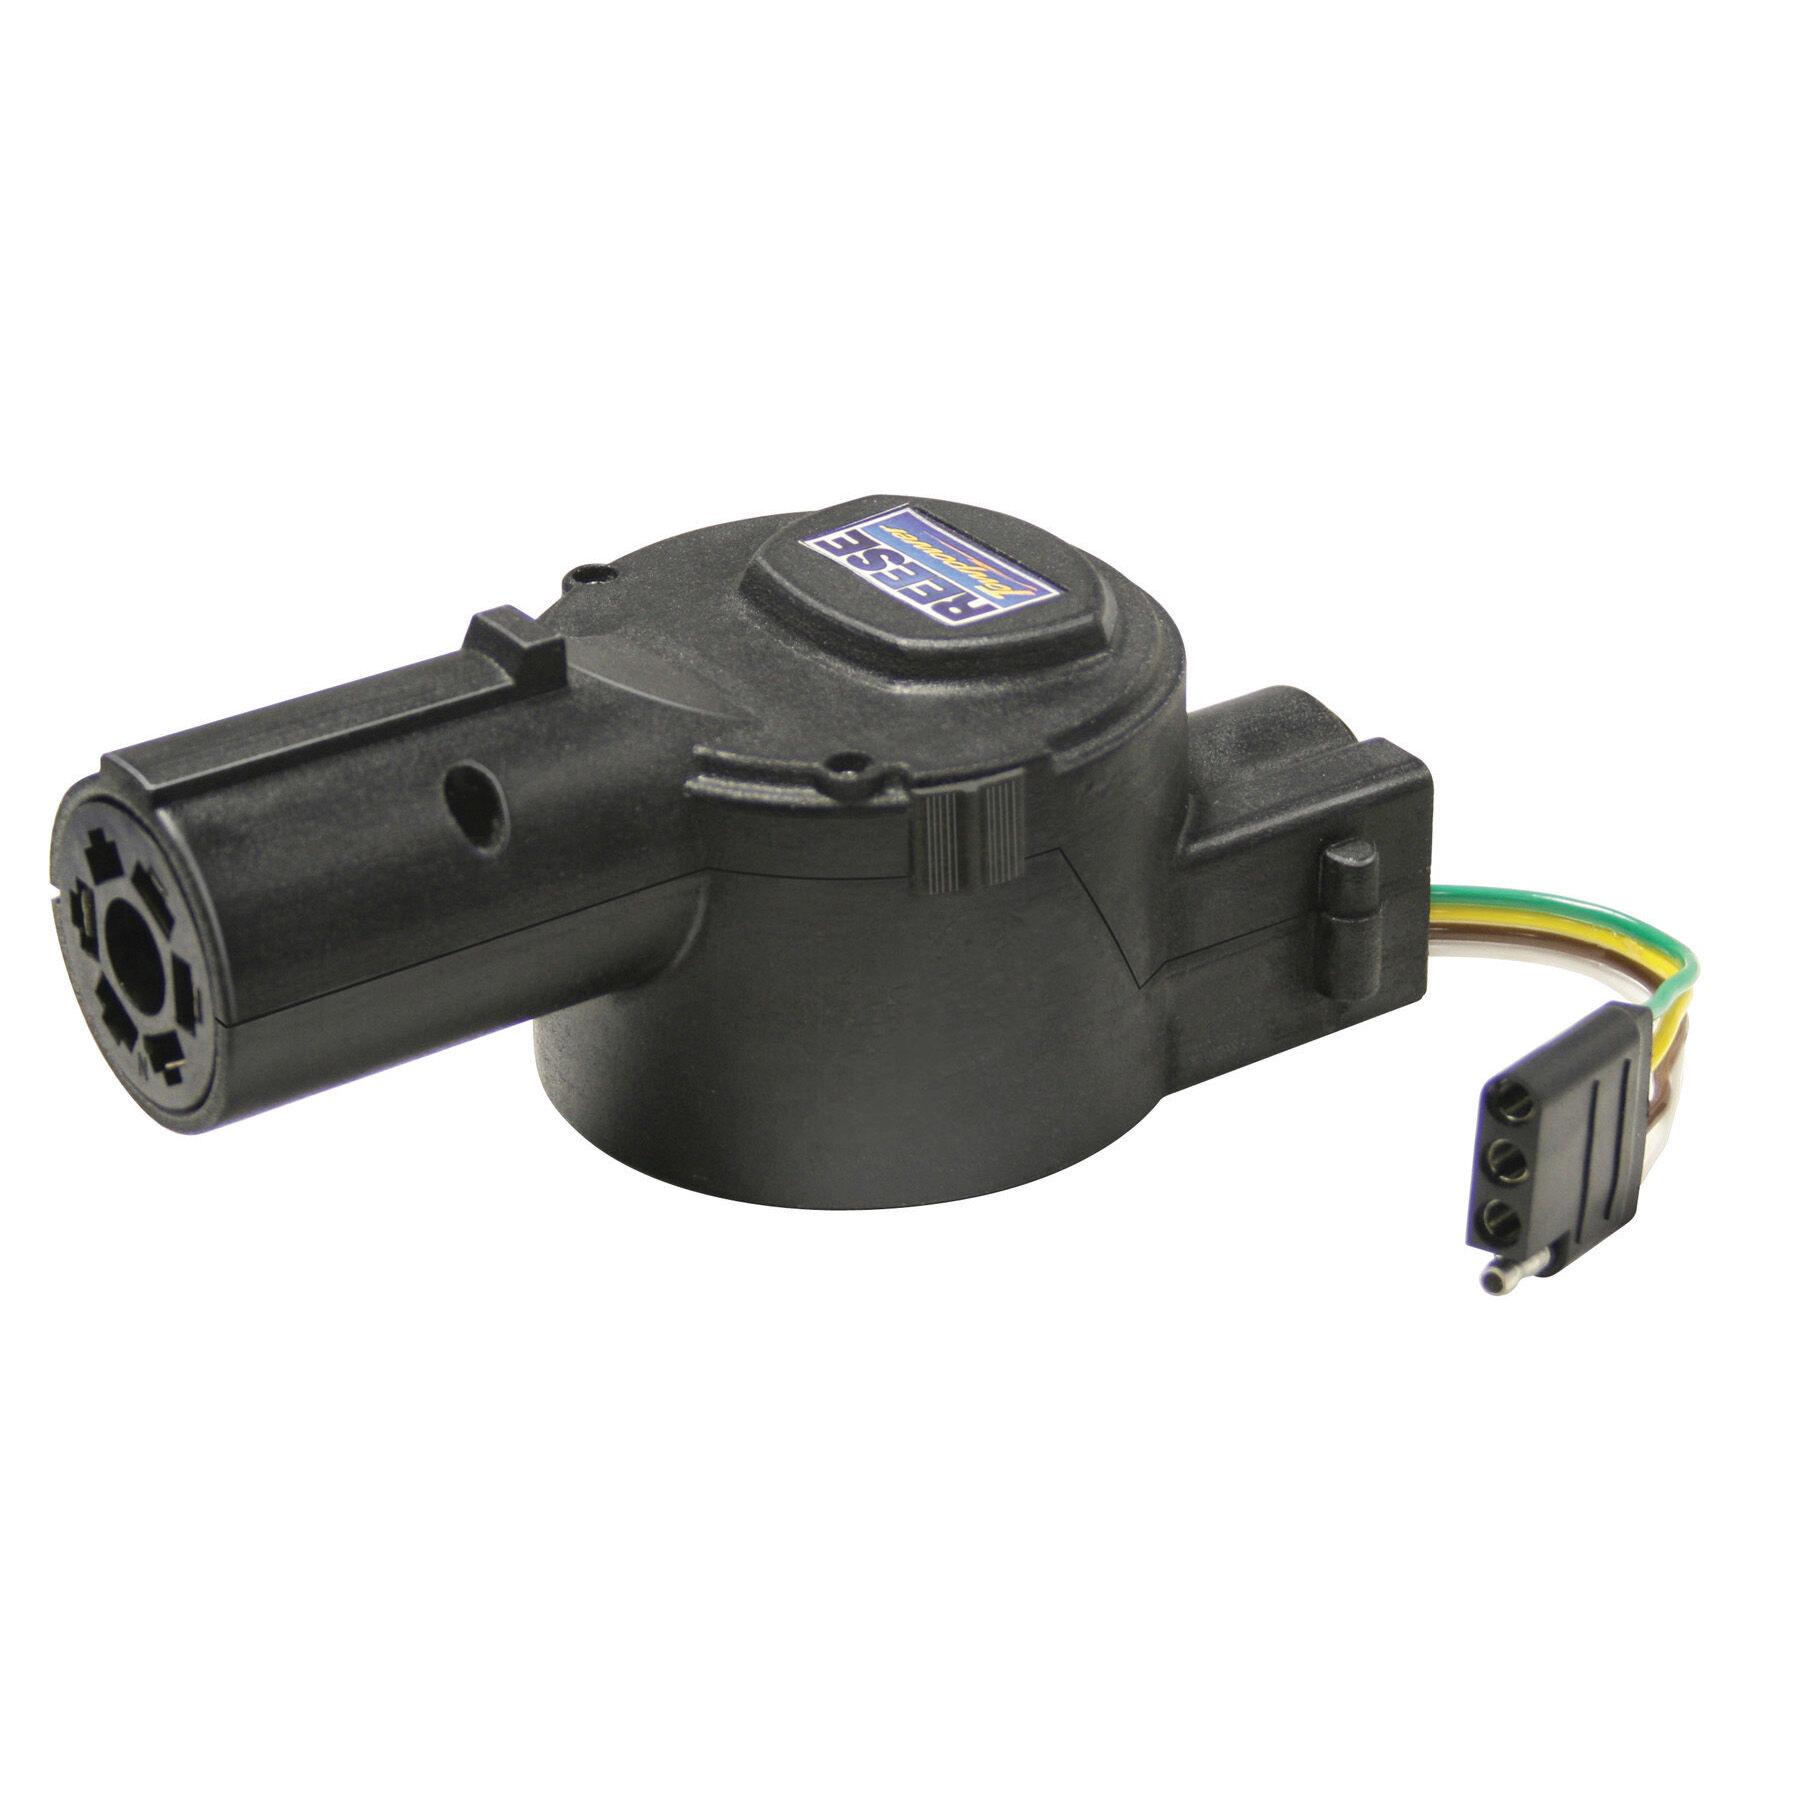 medium resolution of fulton 7 way round plug to 4 wire flat plug retractable trailer wiring adapter overton s